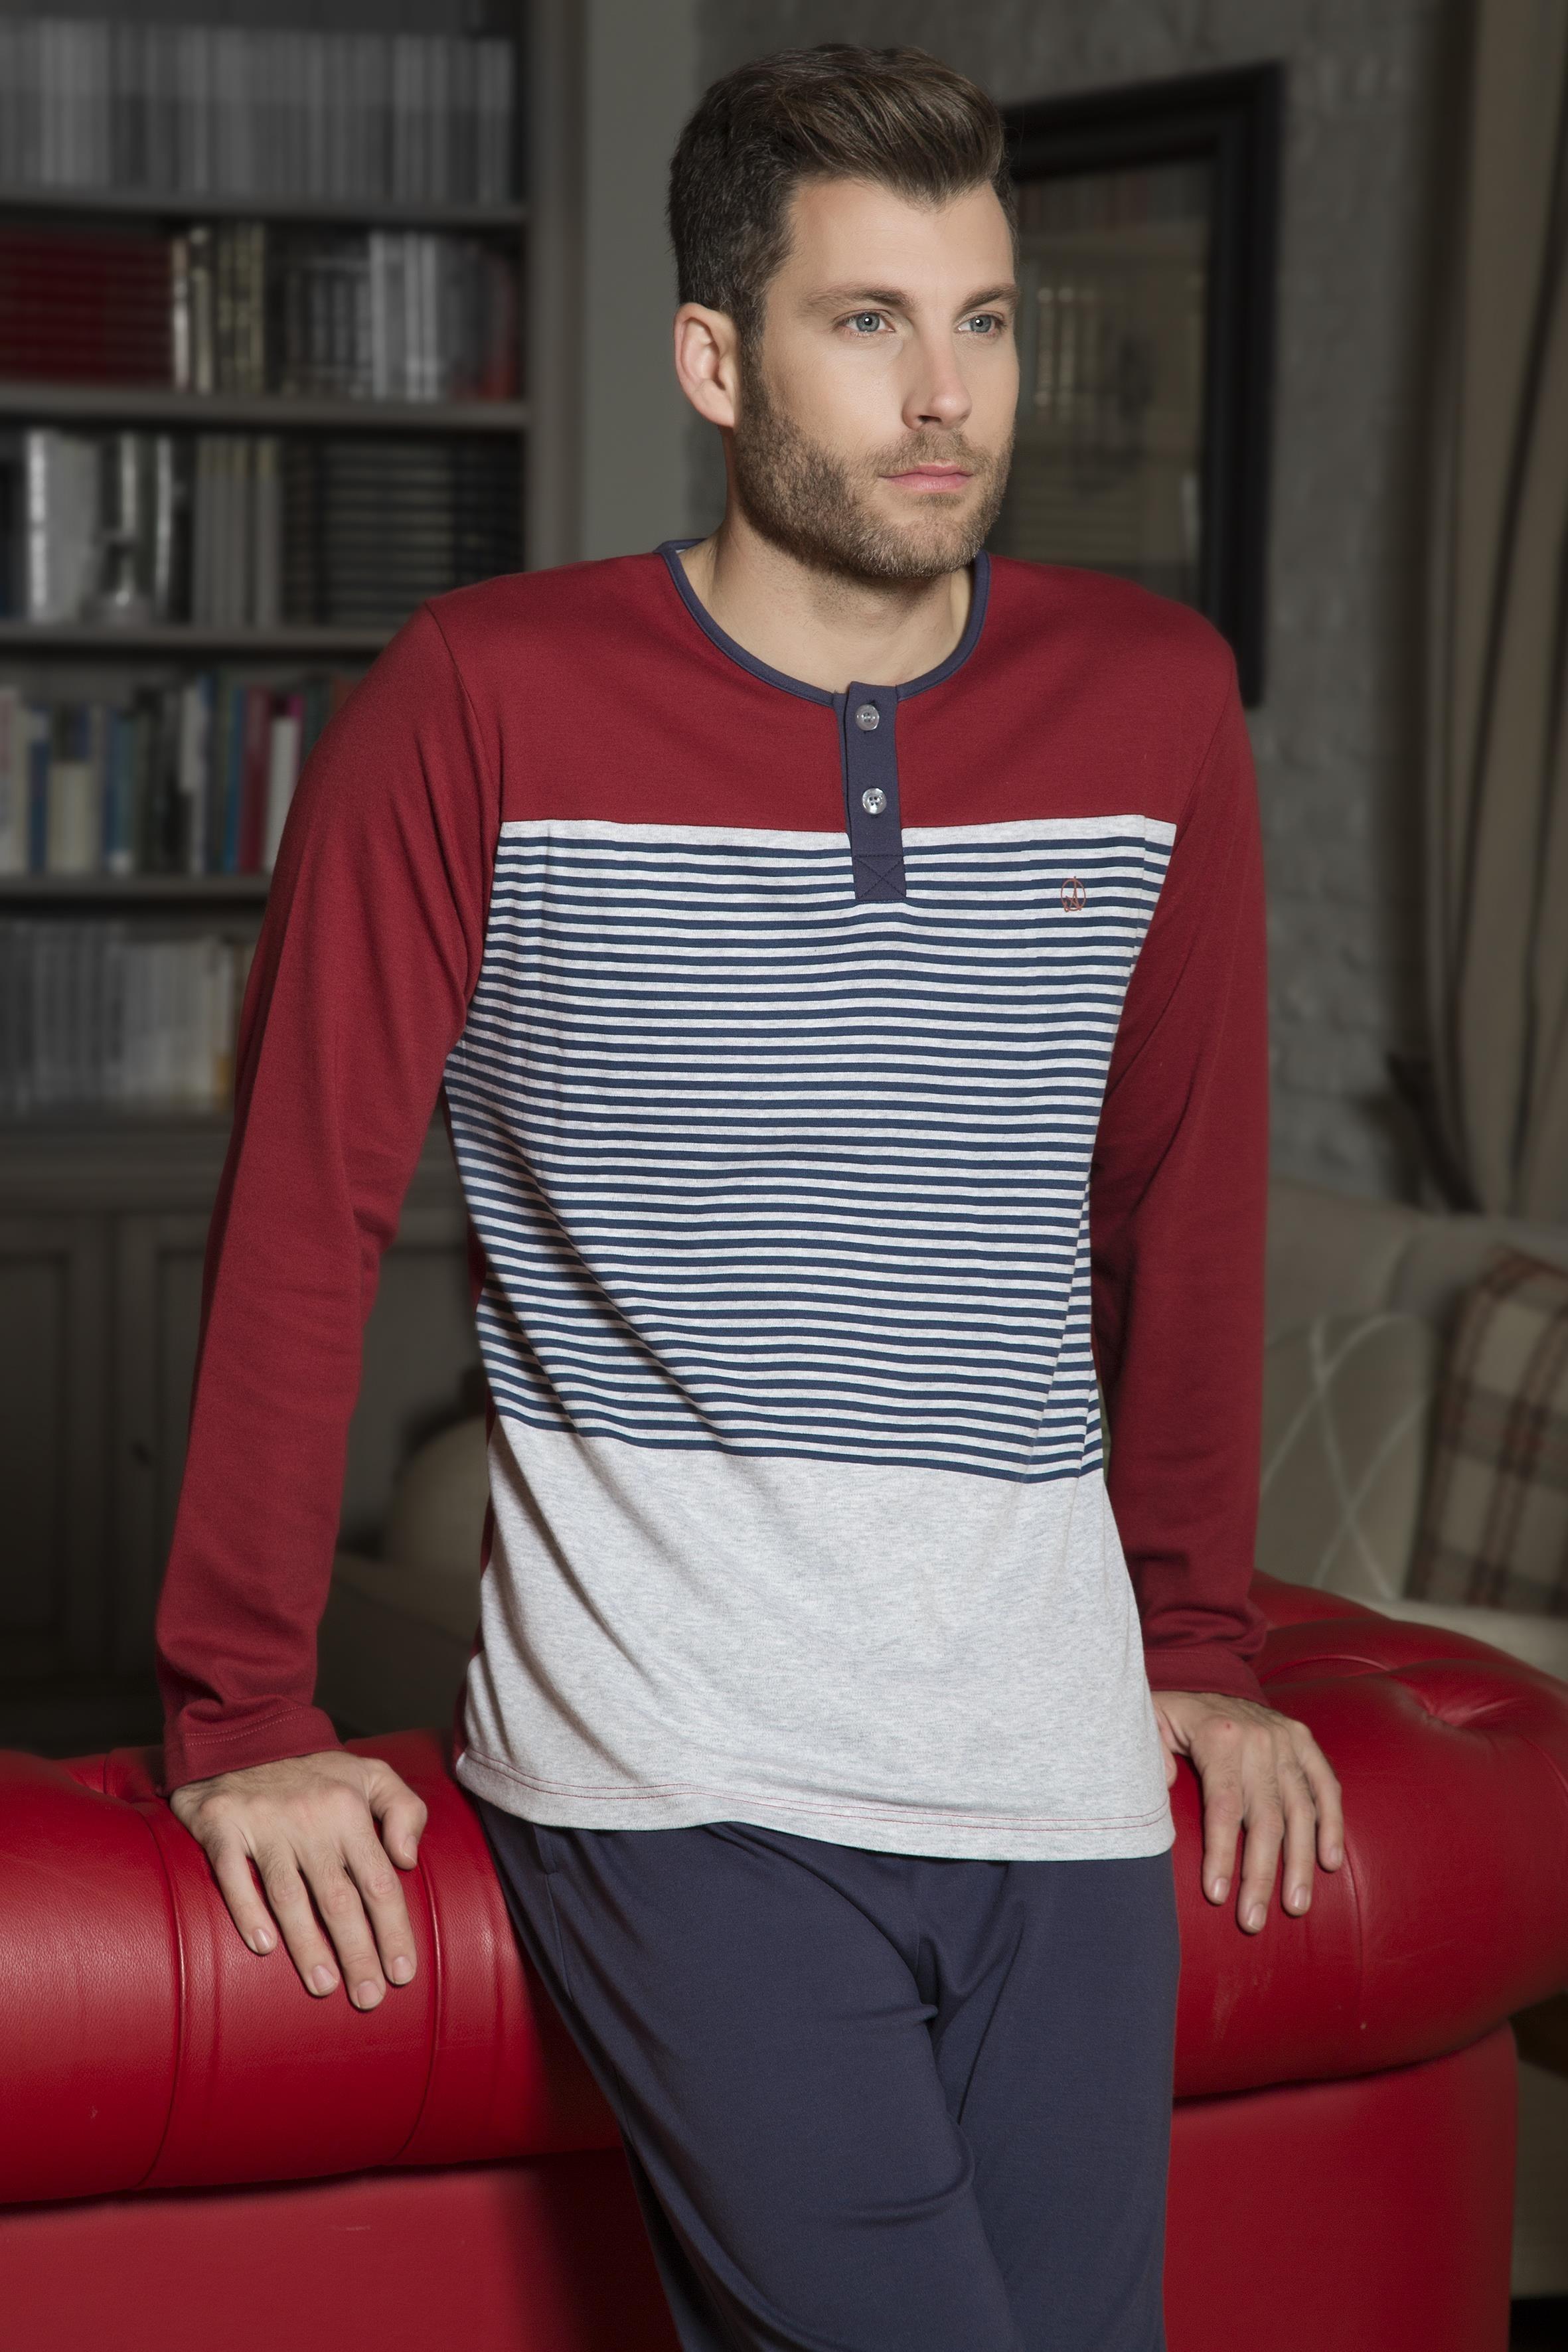 Pijama caballero suave arabe